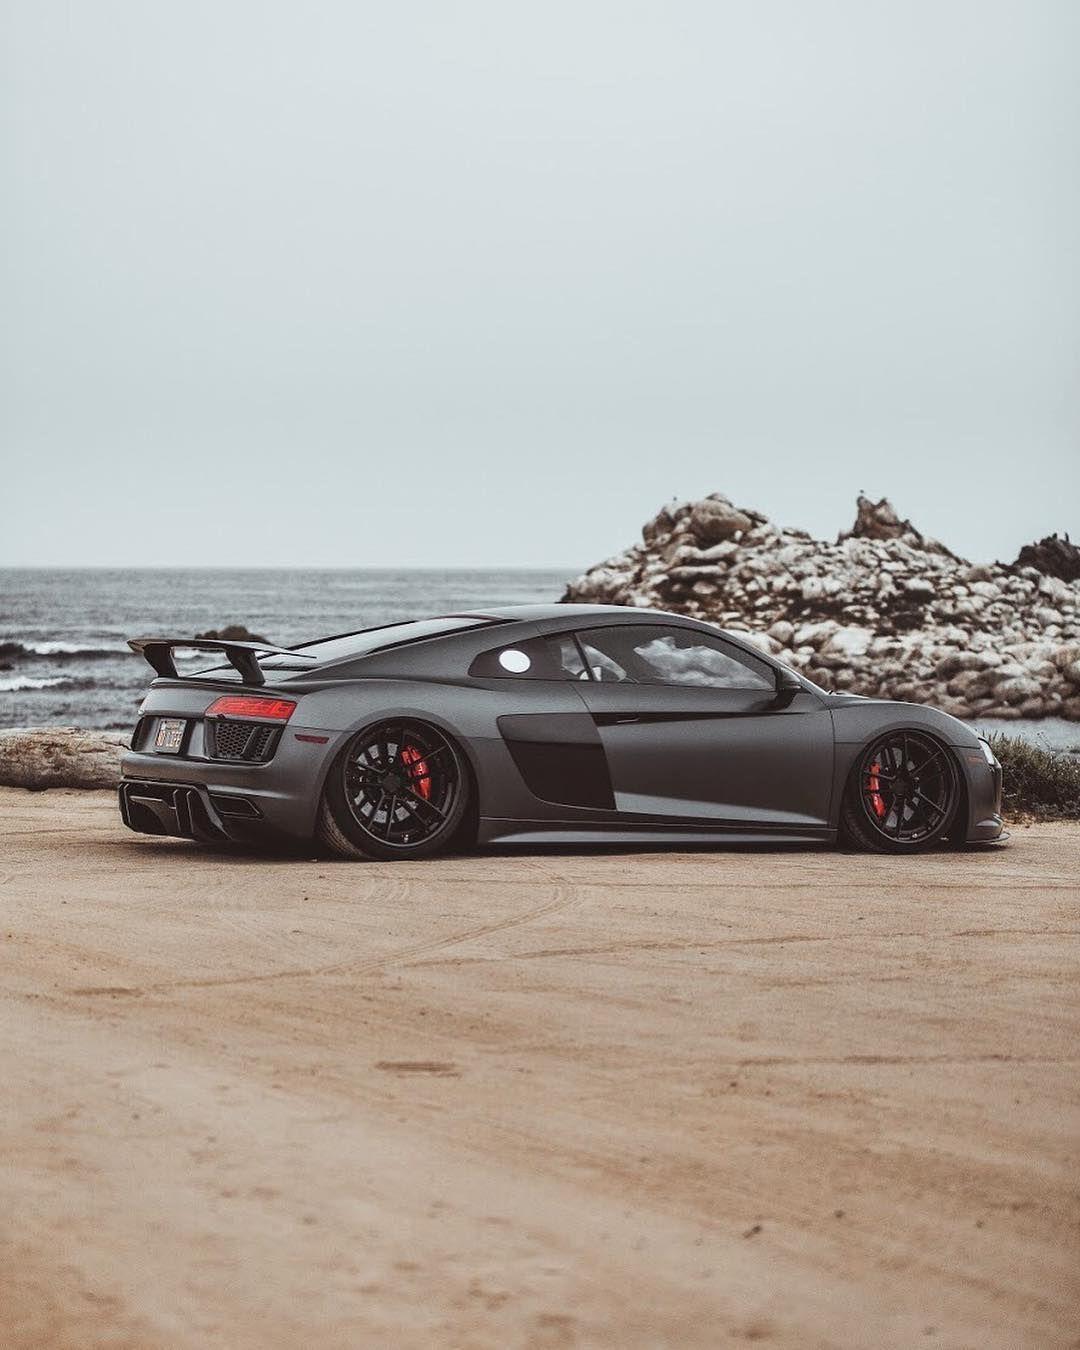 Audi R8 Audi R8 Audi R8 Audi R8